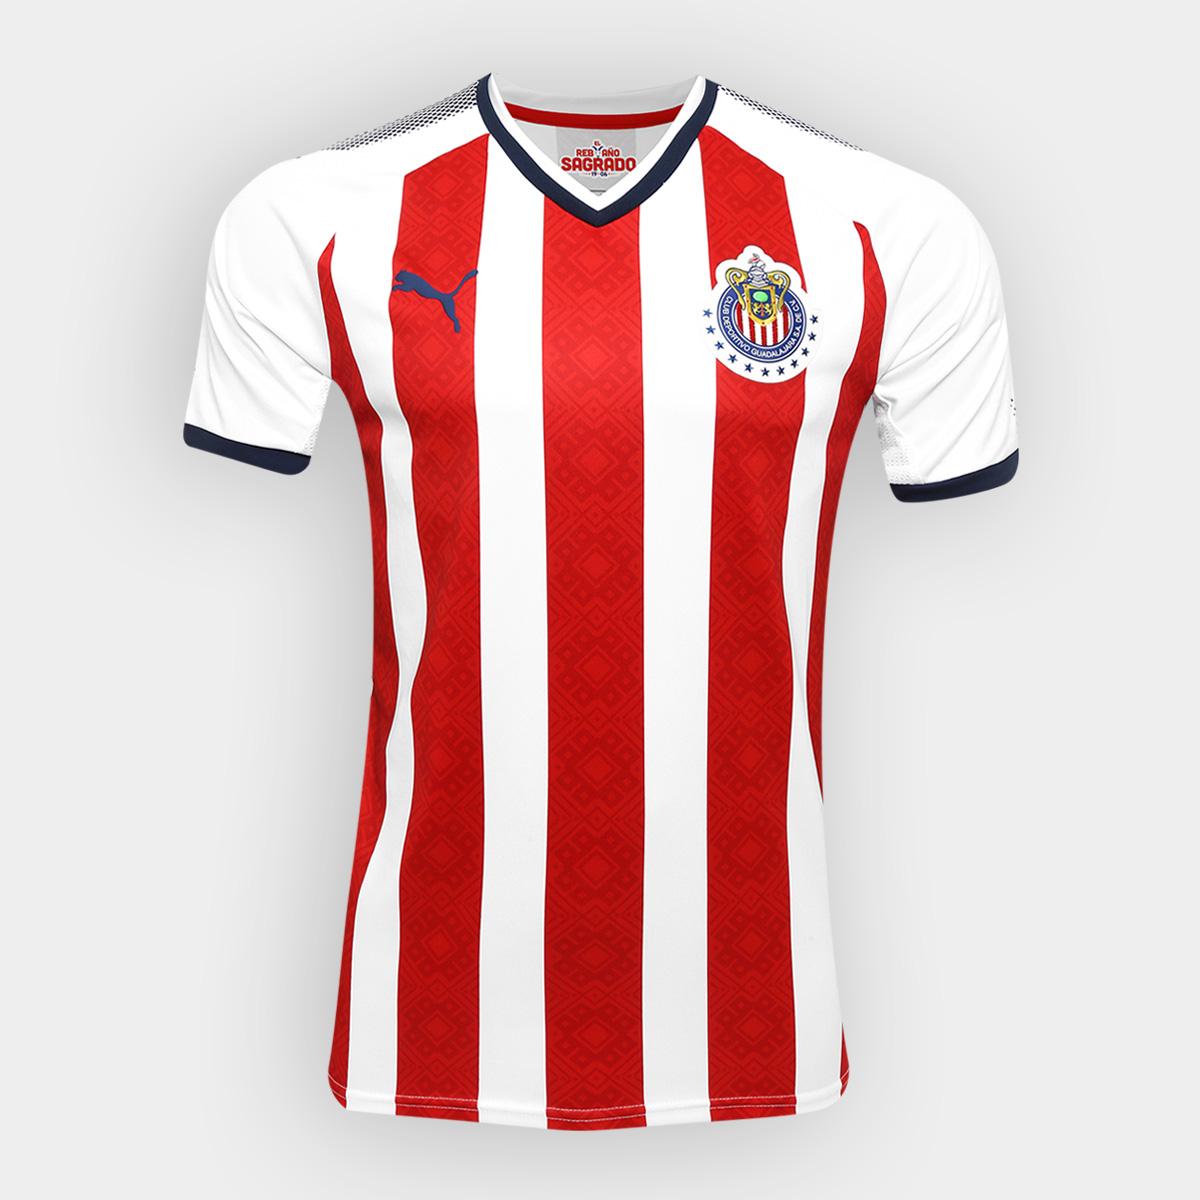 differently abffc 11b6a Chivas 17/18 Puma Home Kit   17/18 Kits   Football shirt blog